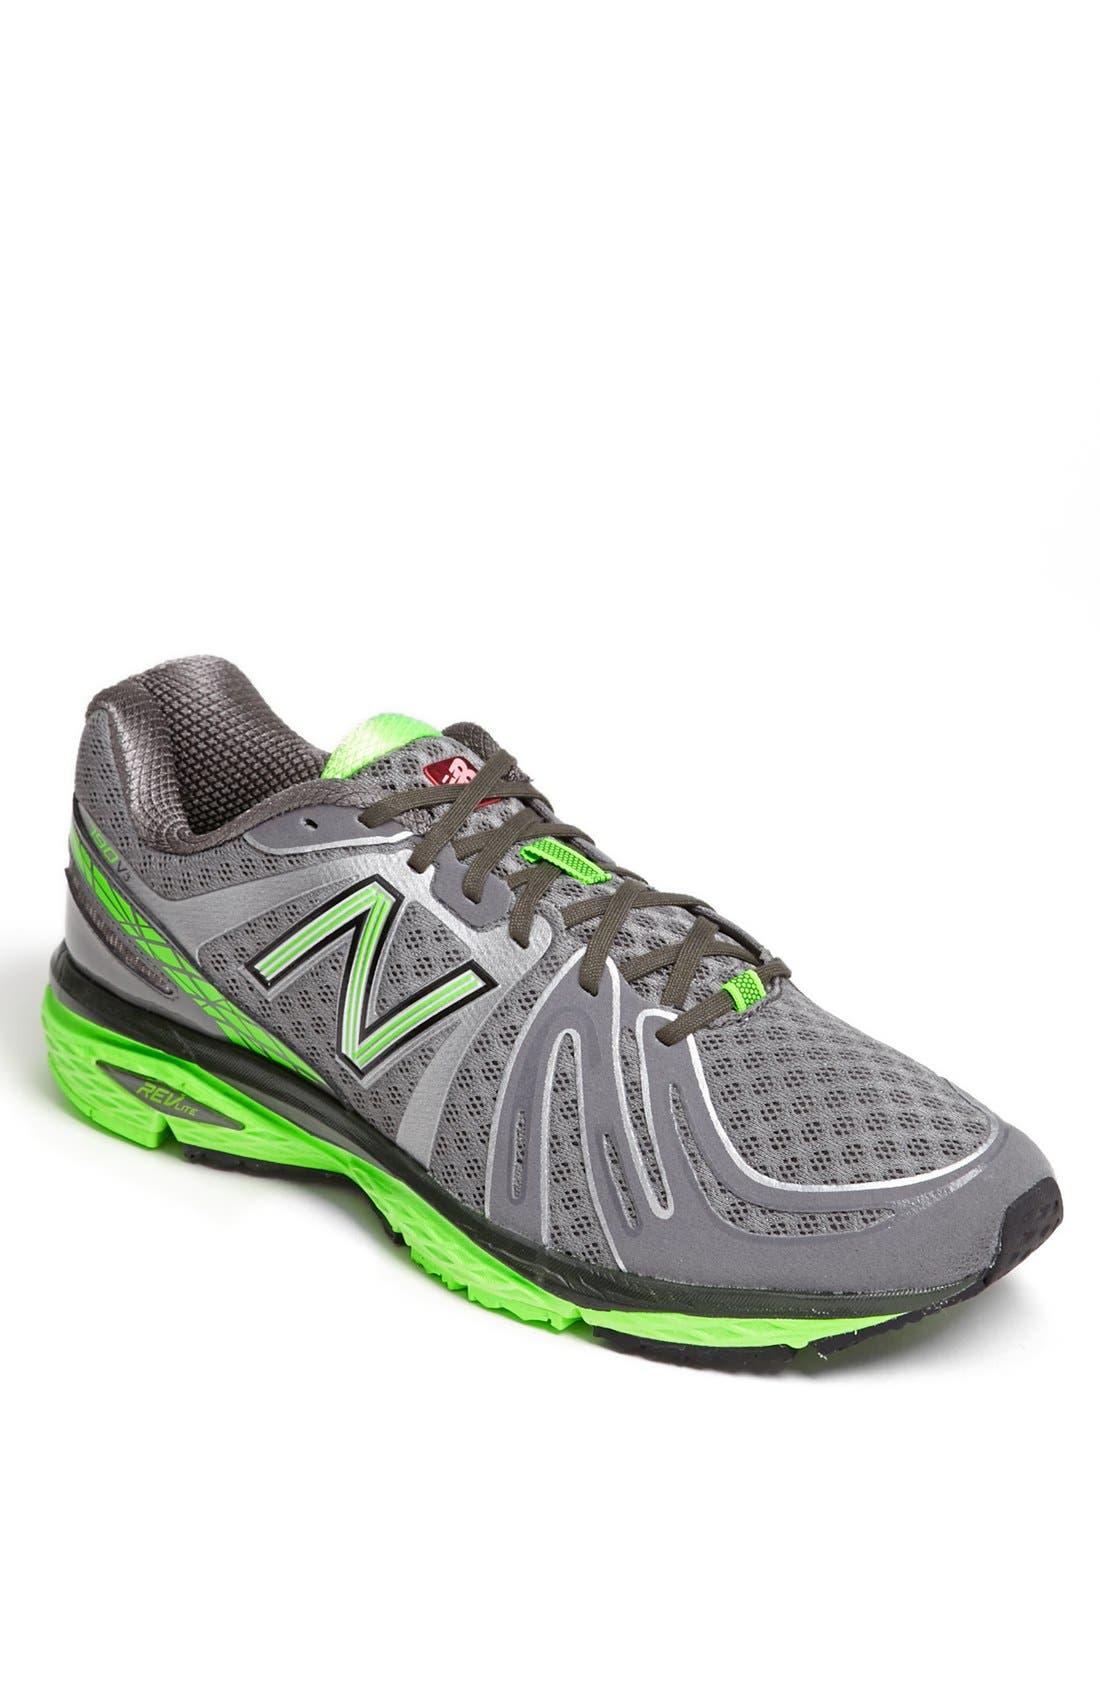 Main Image - New Balance '790' Running Shoe (Men) (Online Only Color)